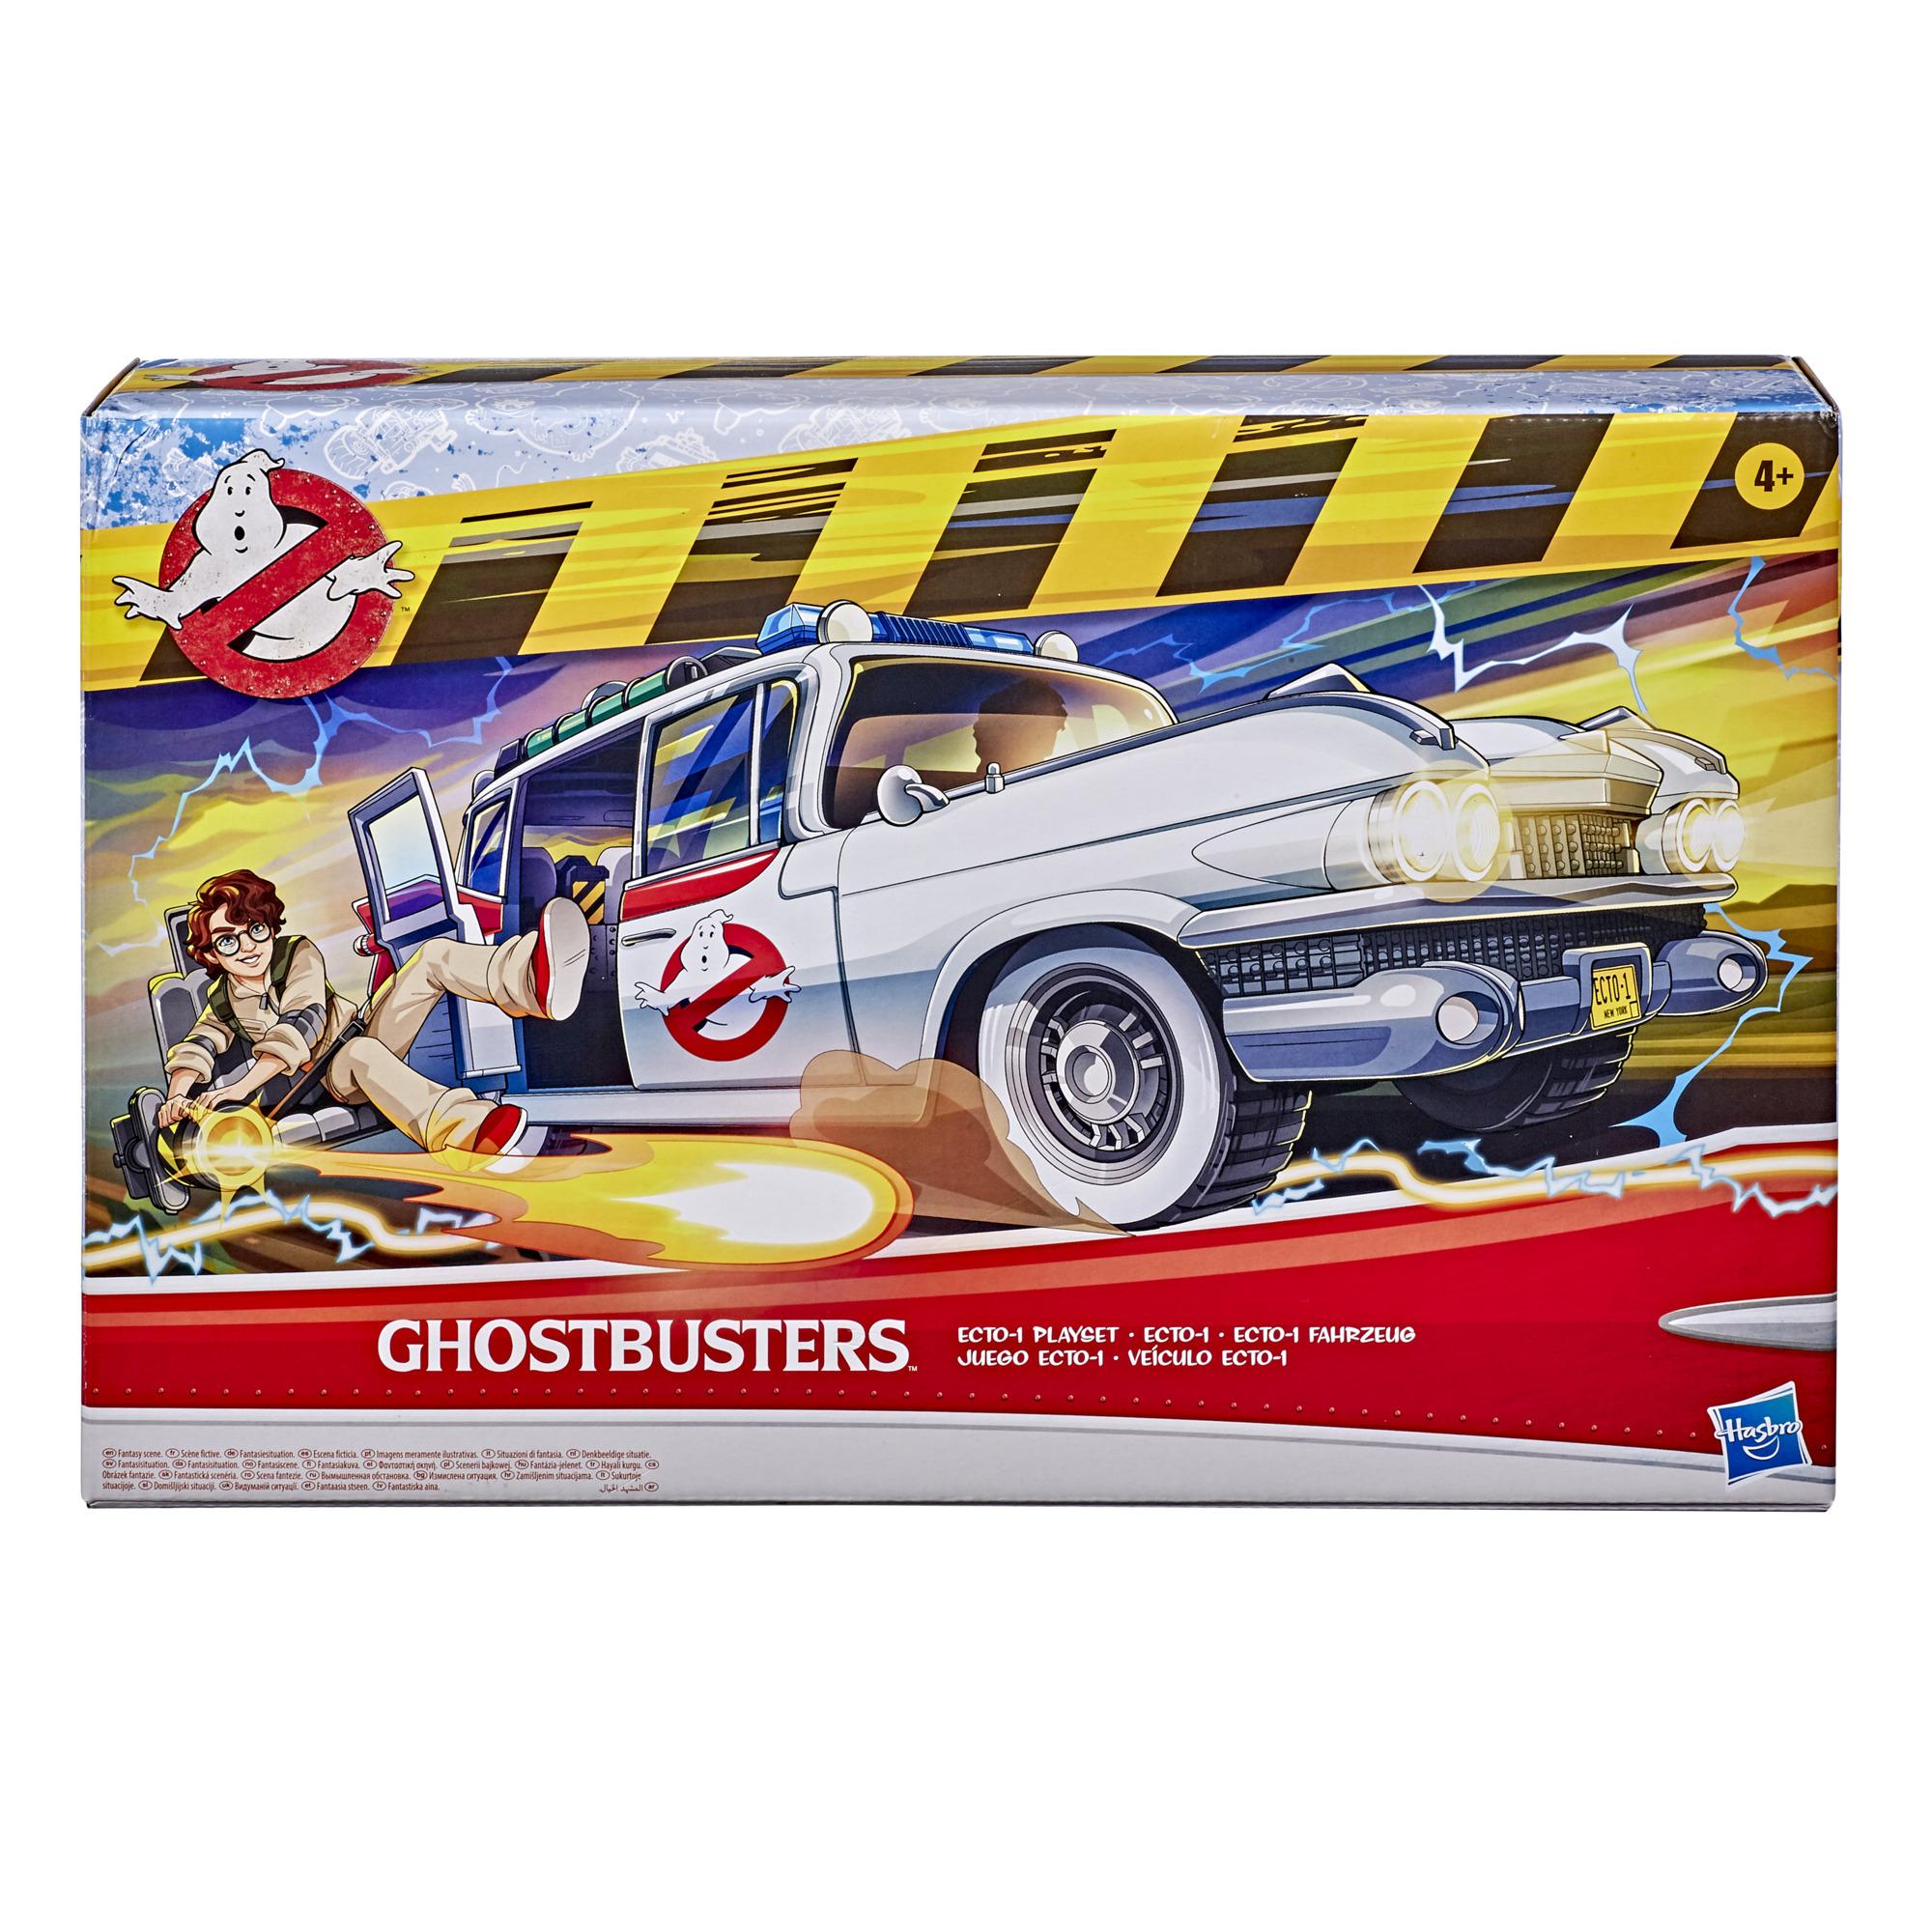 Hasbro Ghostbusters Ecto-1 Playset E95635L0 5010993688876